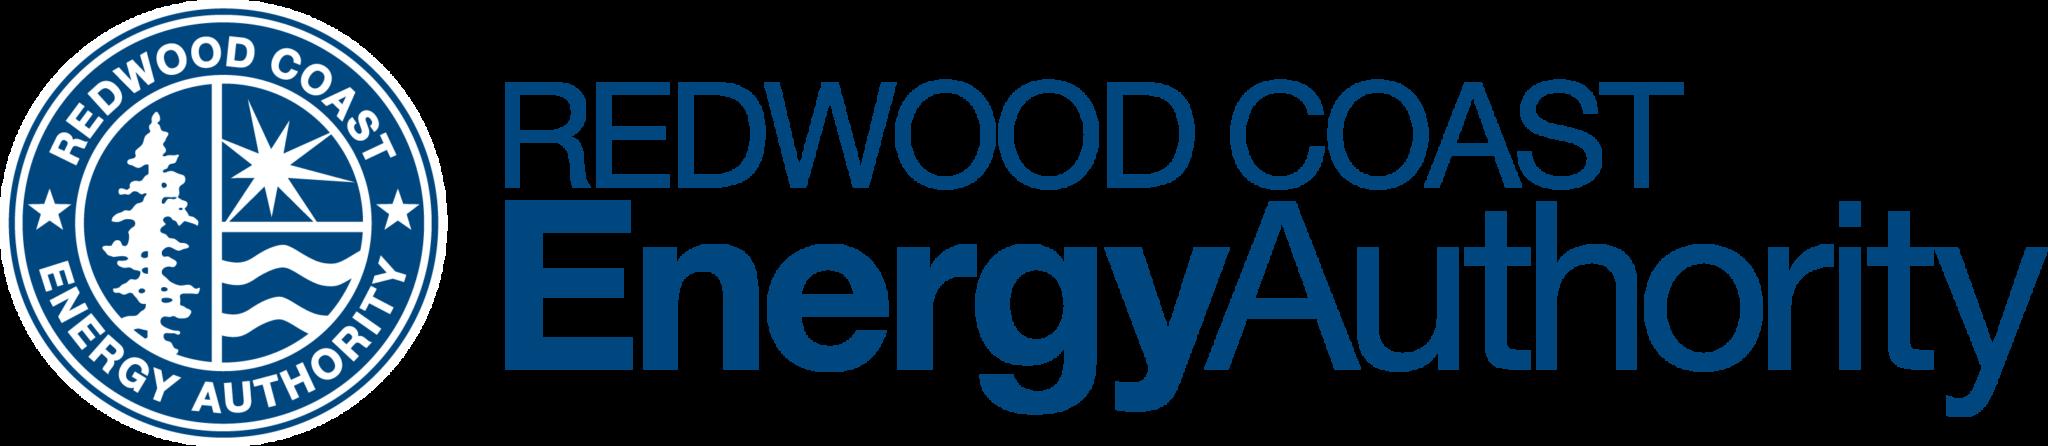 logo of redwood coast energy authority